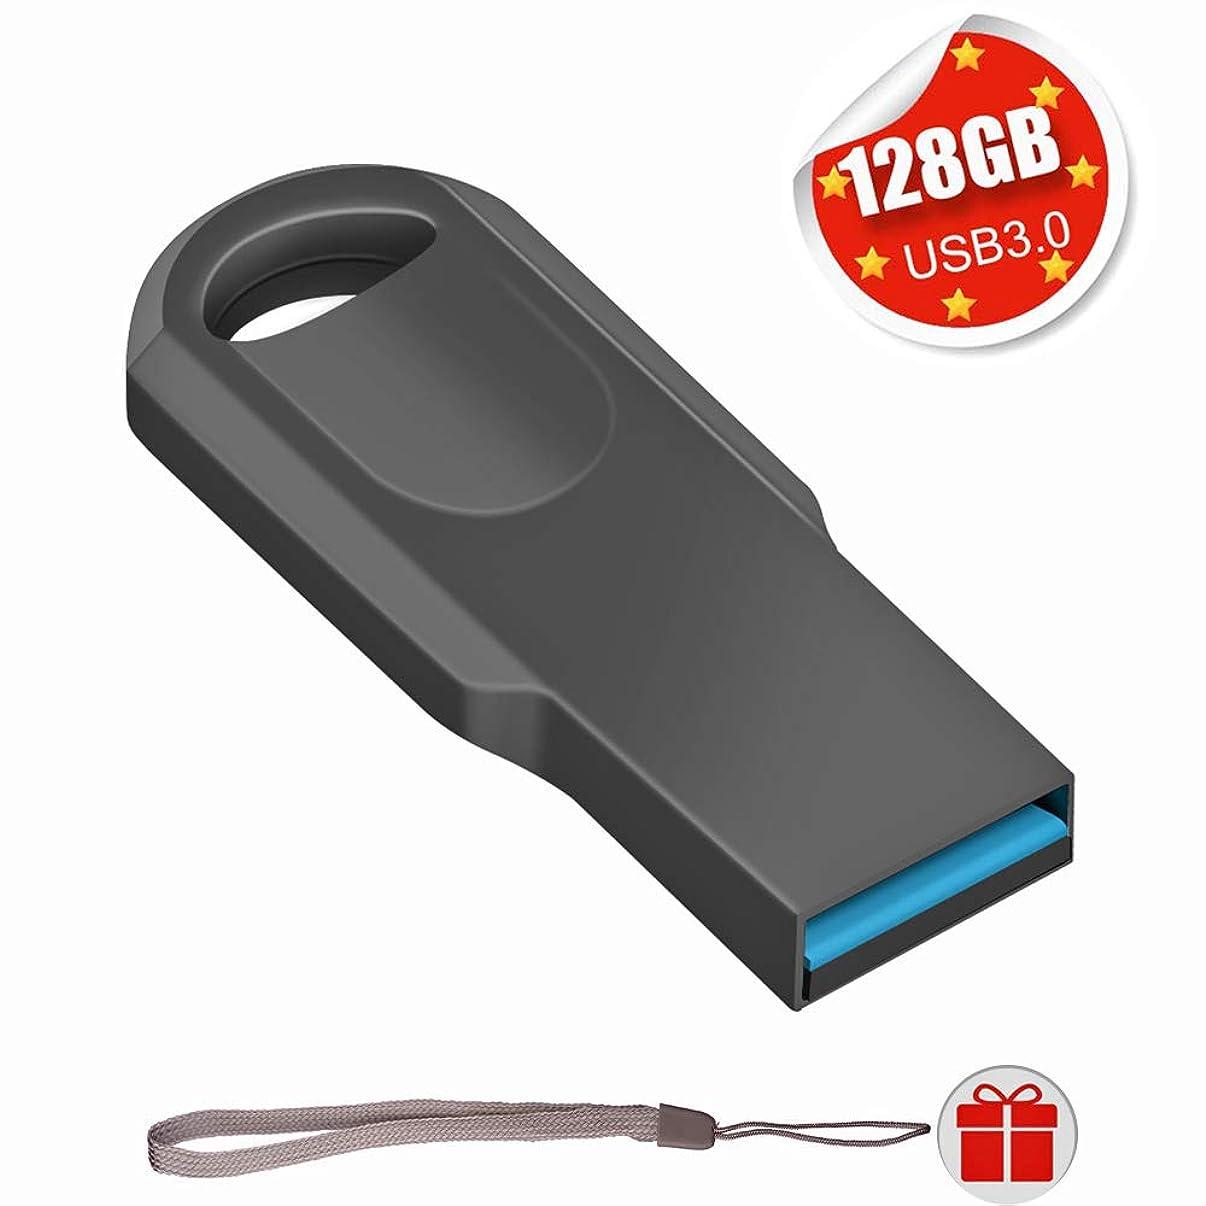 128GB Flash Drive USB 3.0, EASTBULL Thumb Drive Memory Stick High Speed USB Metal Flash Drive Pen Drive for Data Storage, Waterproof & Shockproof USB Drive with Lanyard (1PCS-Grey)